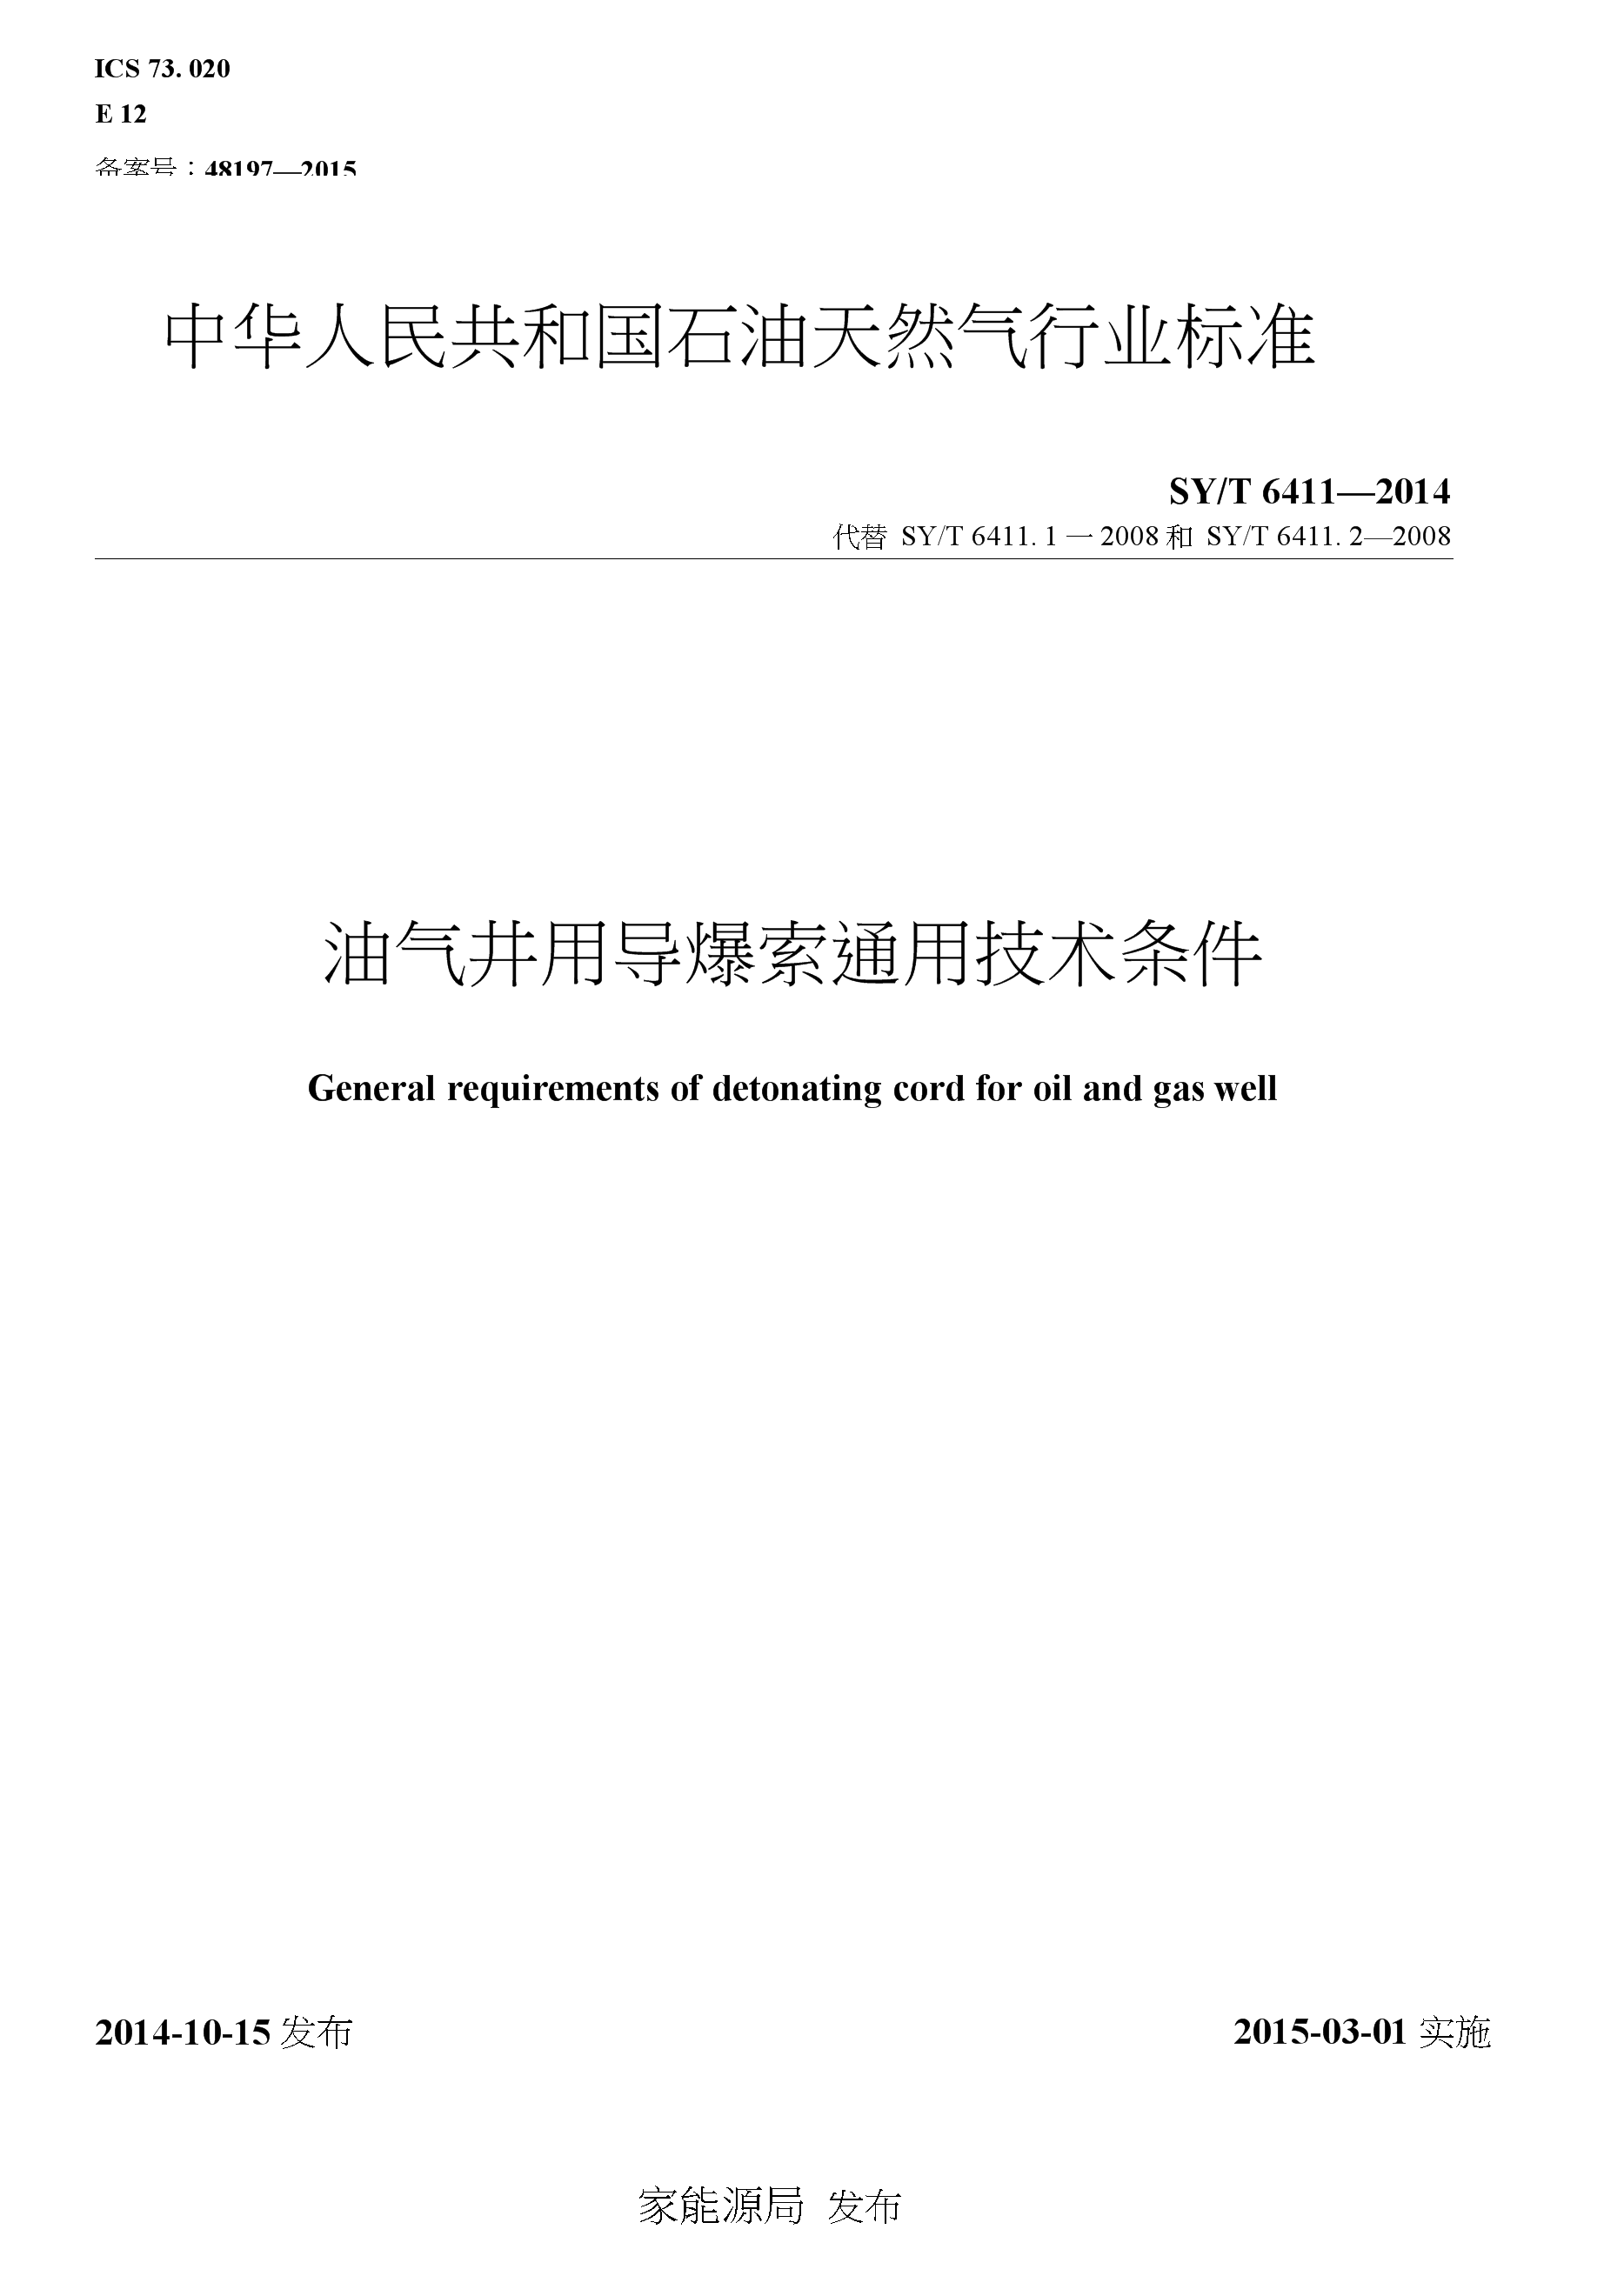 SY∕T 6 411-2014 油气井用导爆索通用技术条件.docx